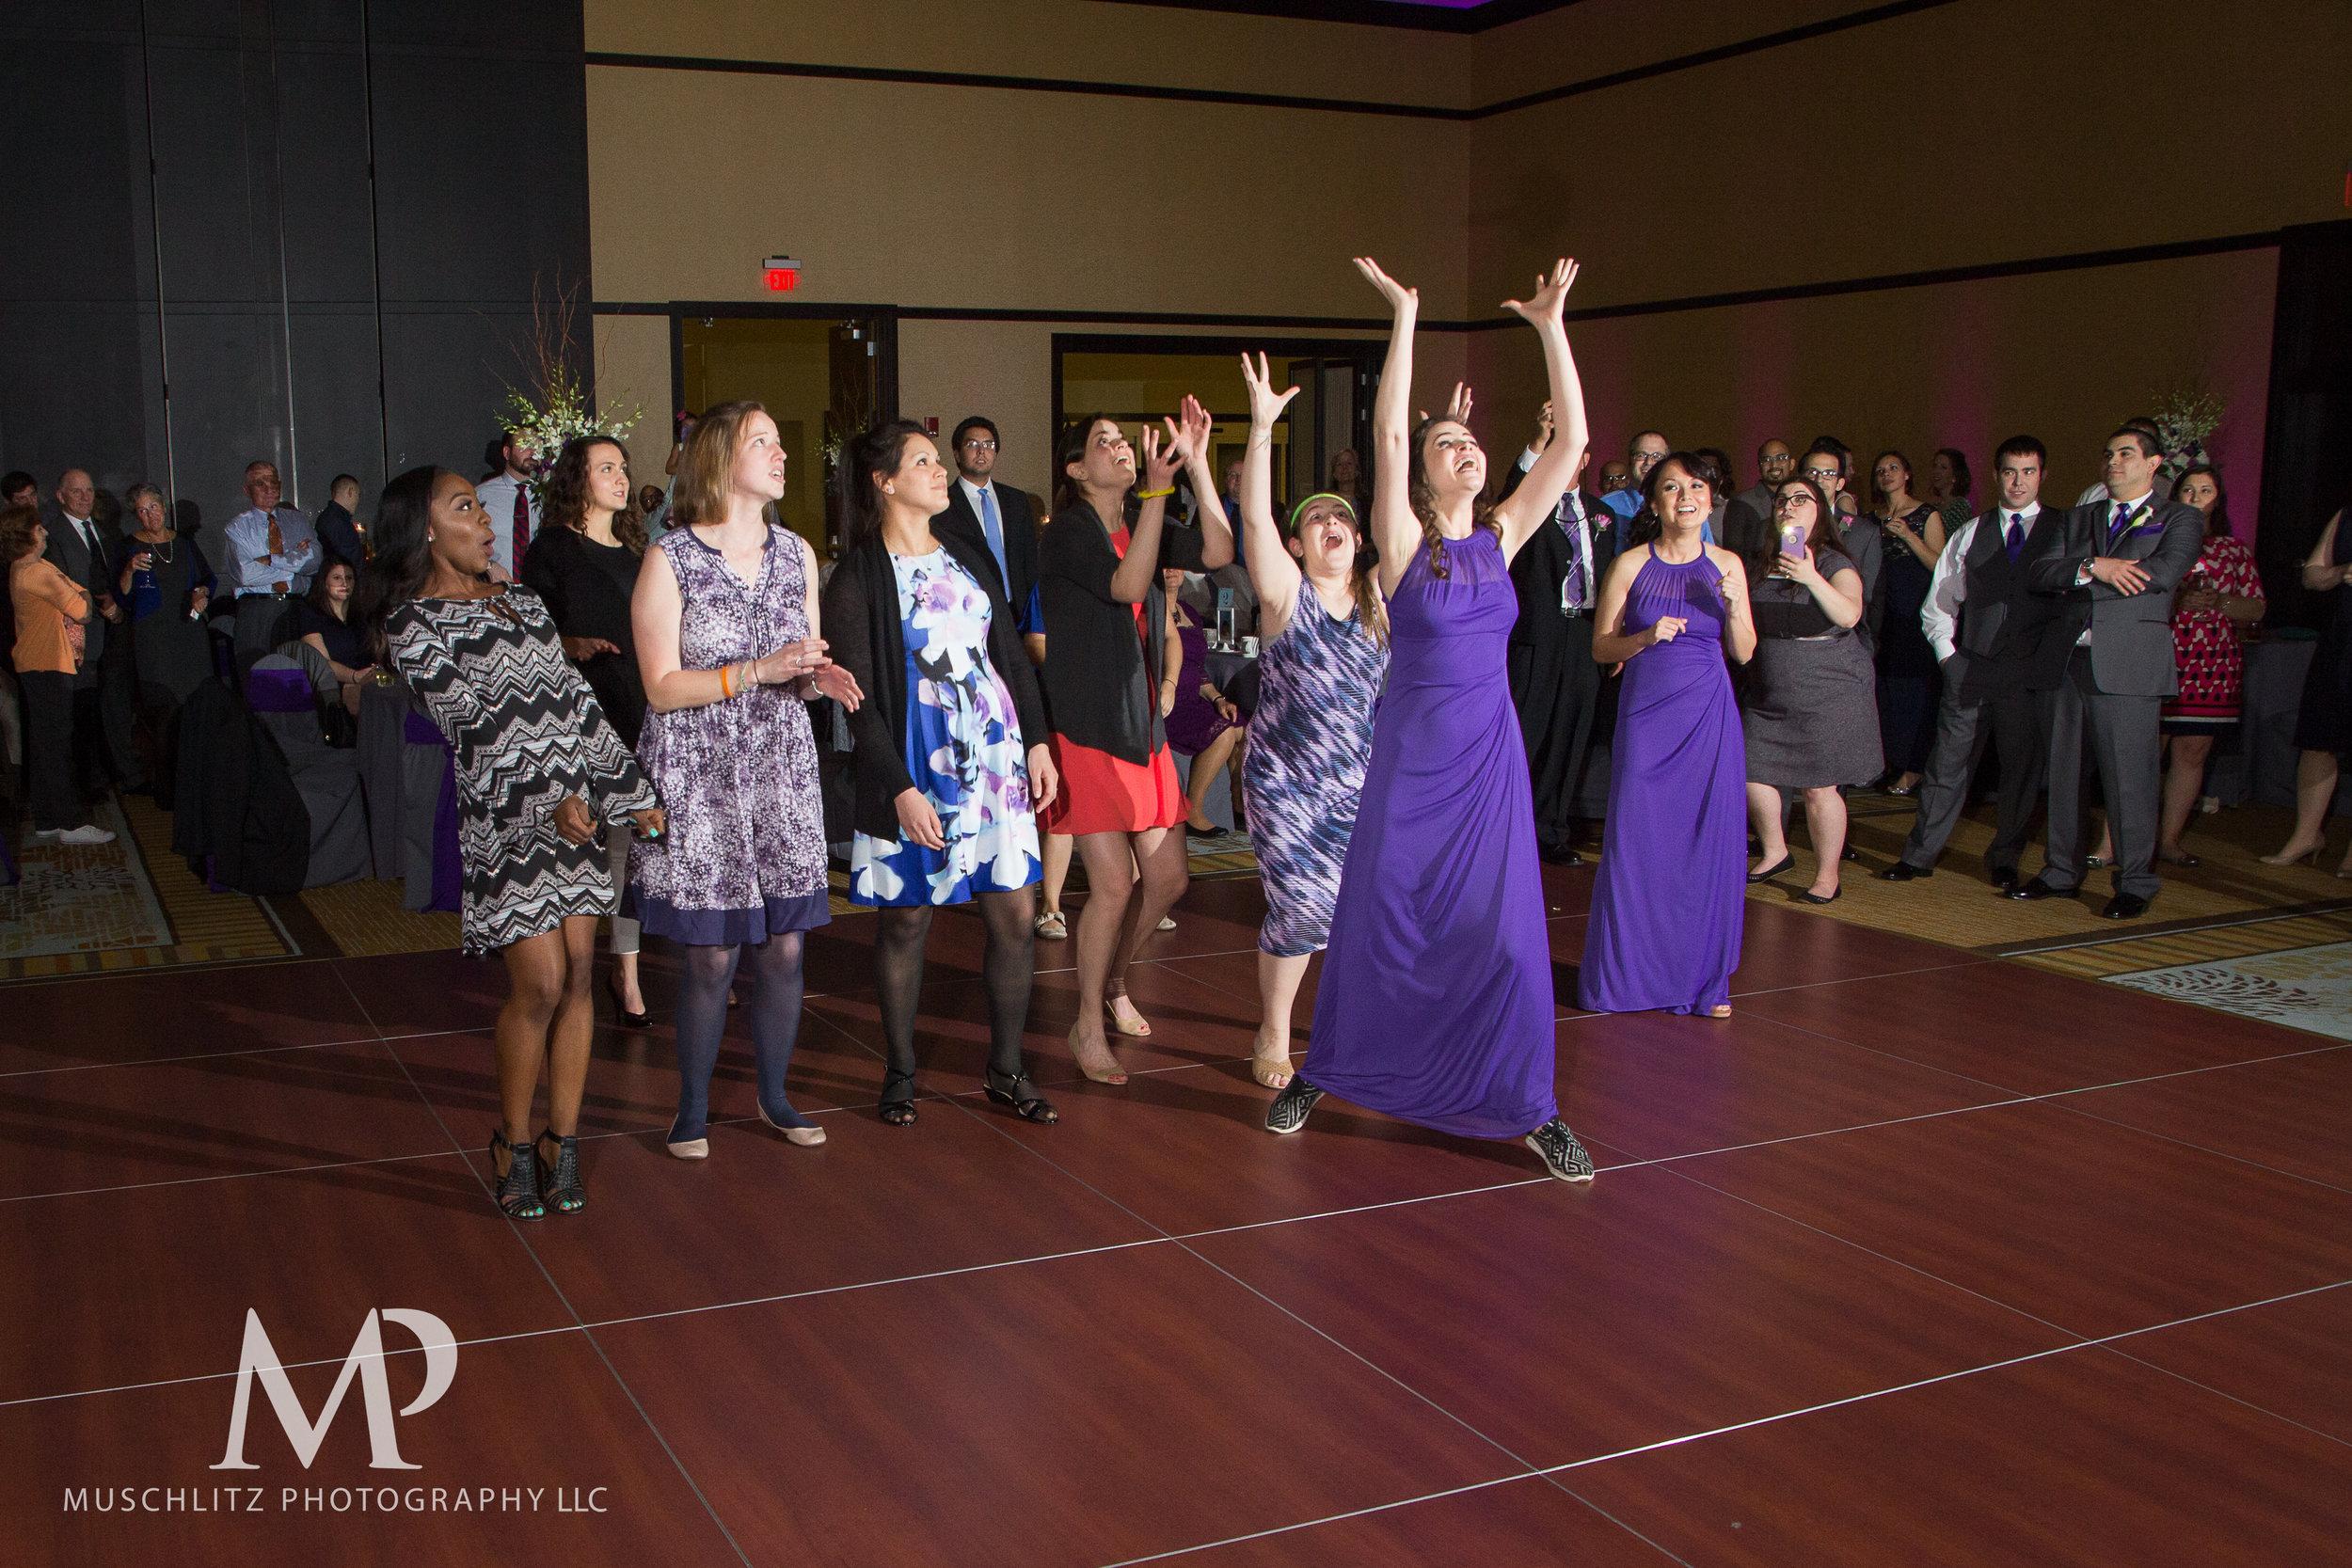 hilton-polaris-wedding-columbus-ohio-muschlitz-photography-070.JPG